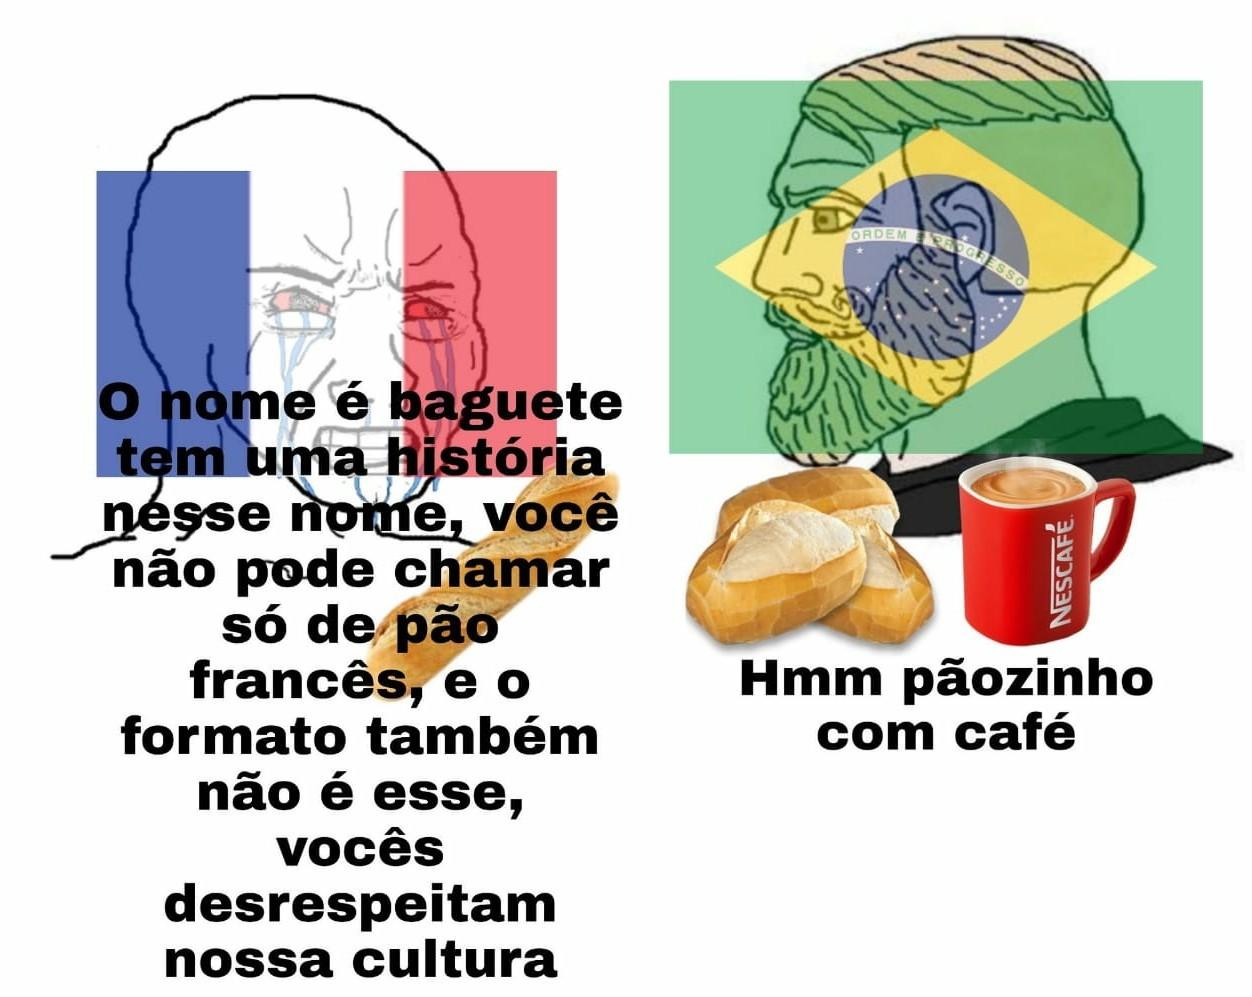 Paozin com cafe hmmmm - meme